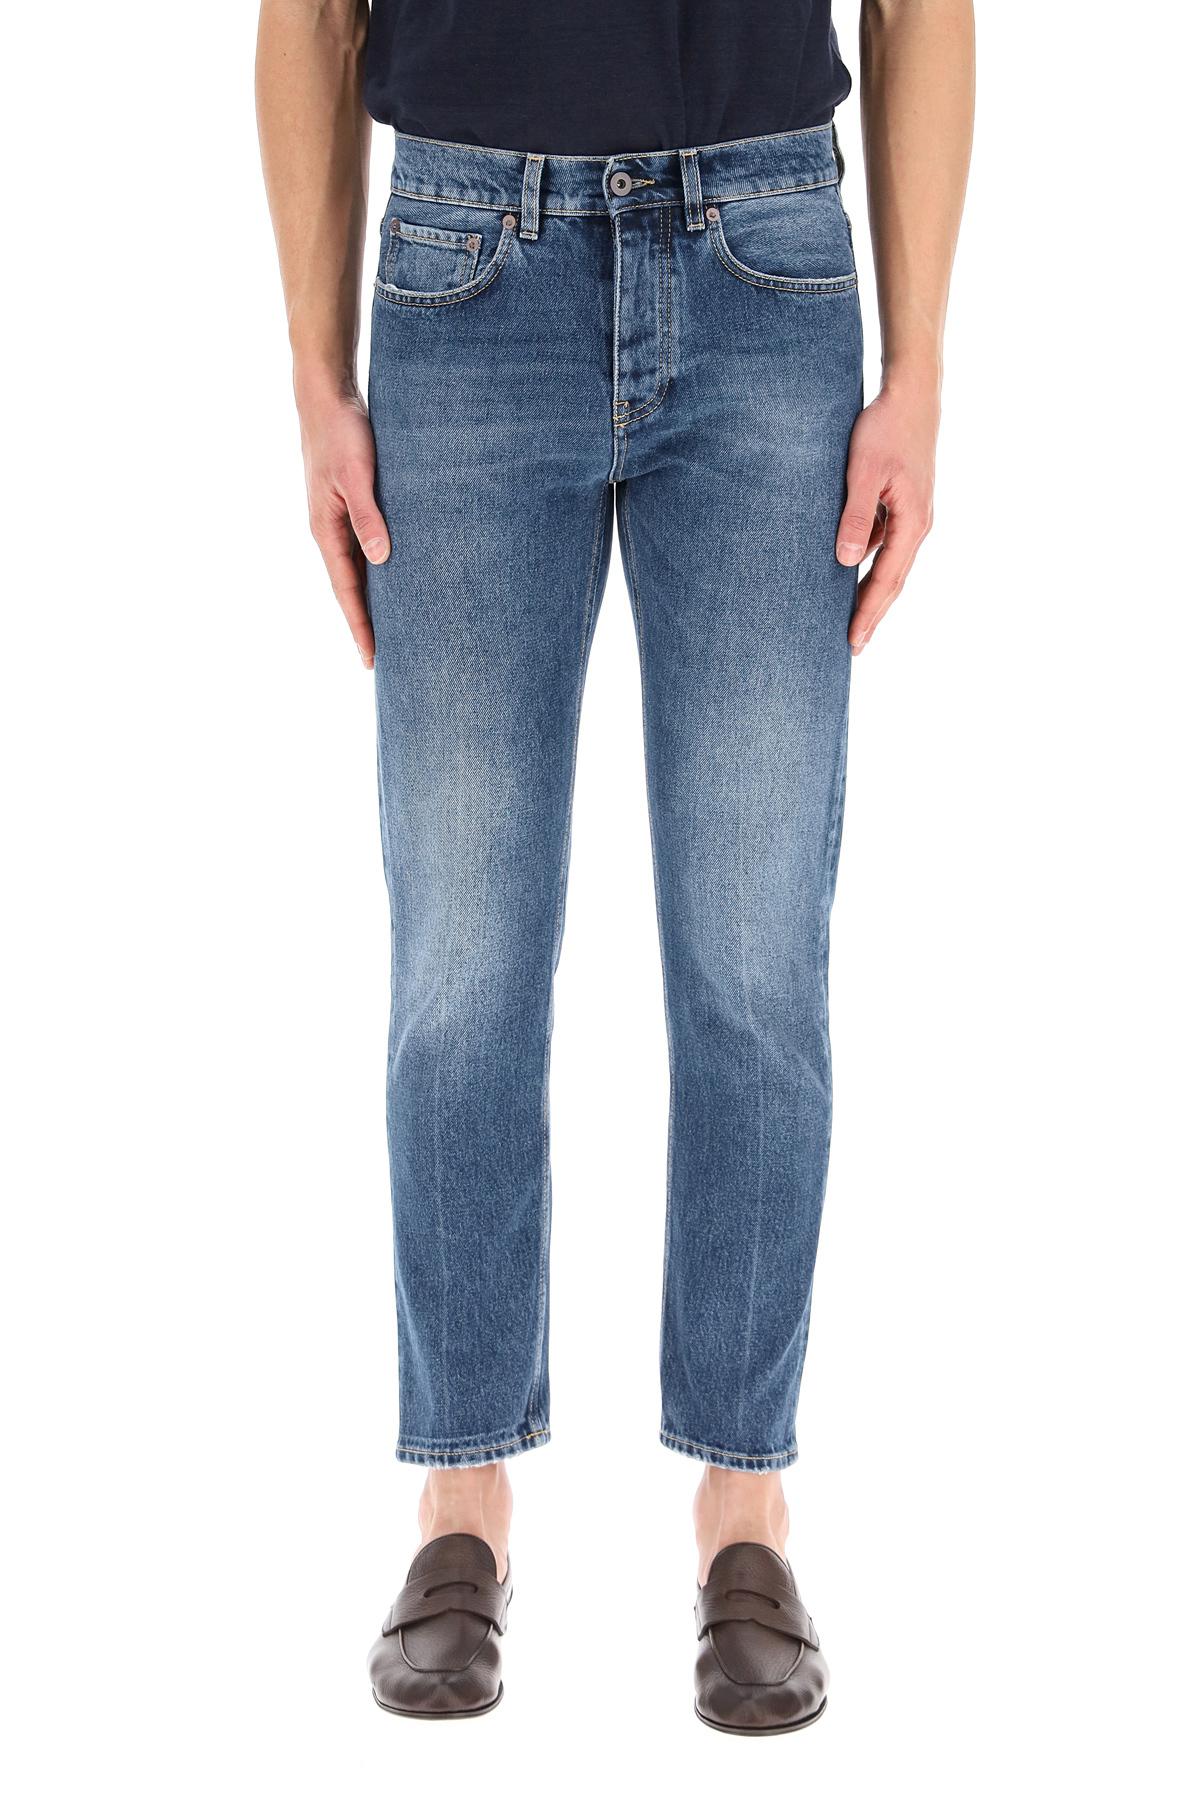 Gm77 jeans slim